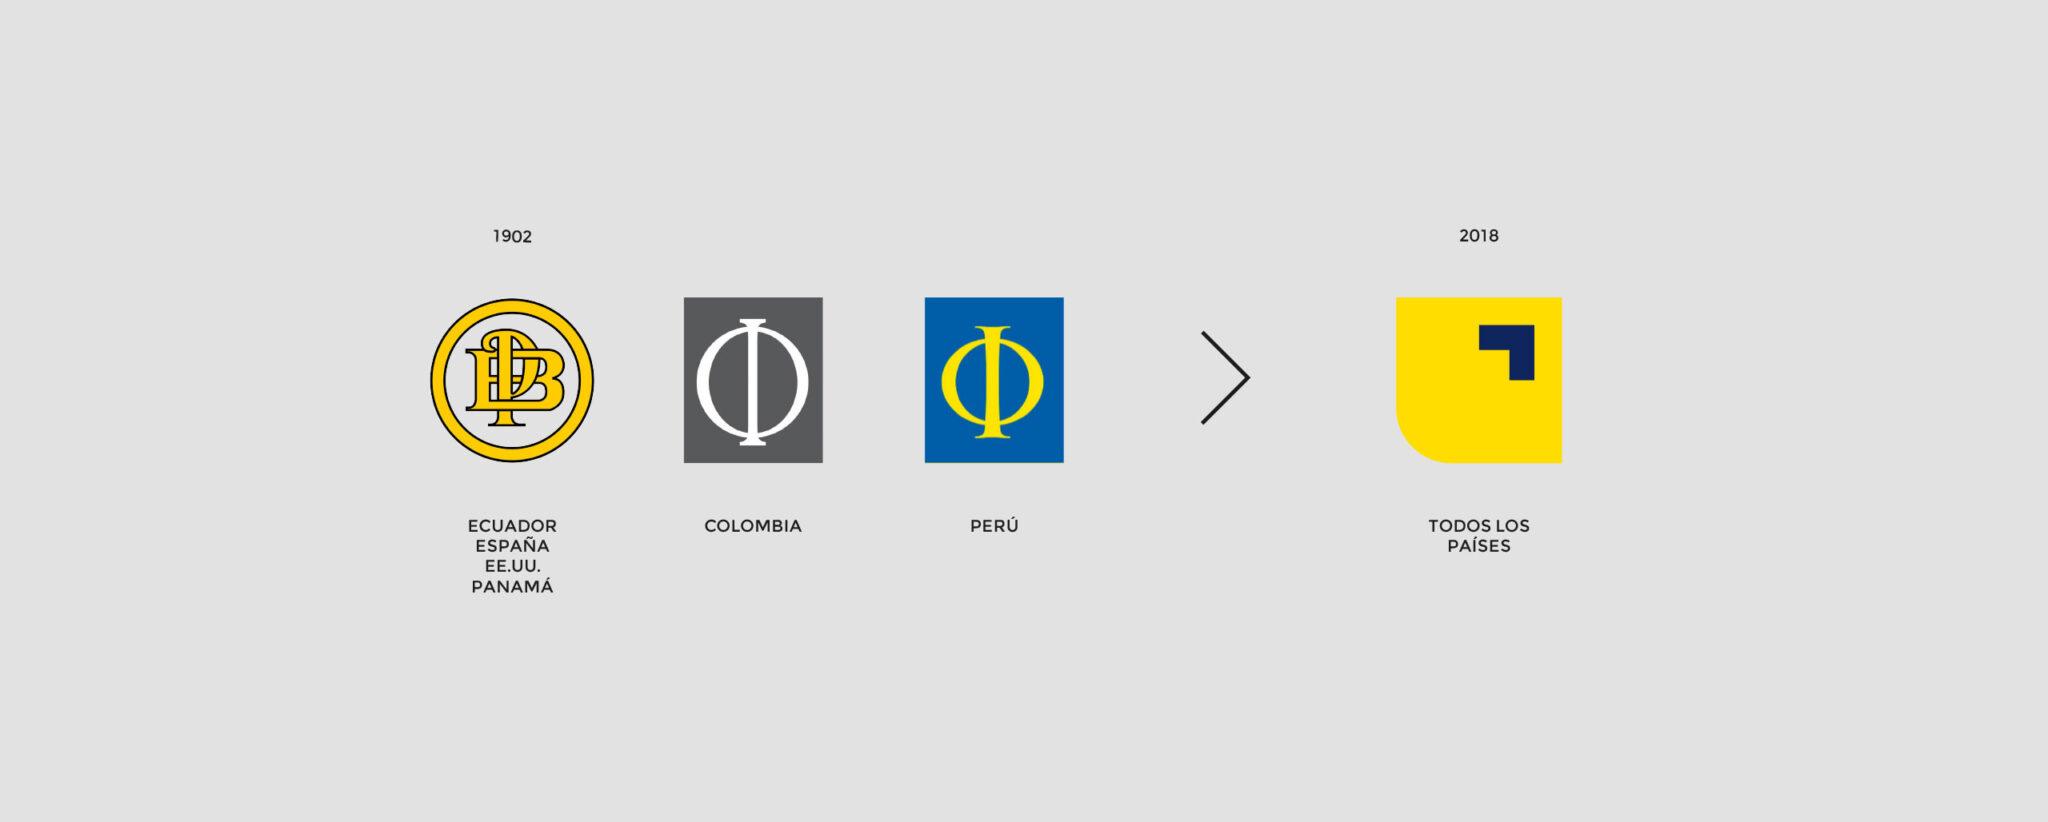 Rediseño Logo Banco Pichincha (Ecuador) - Ideakreativa